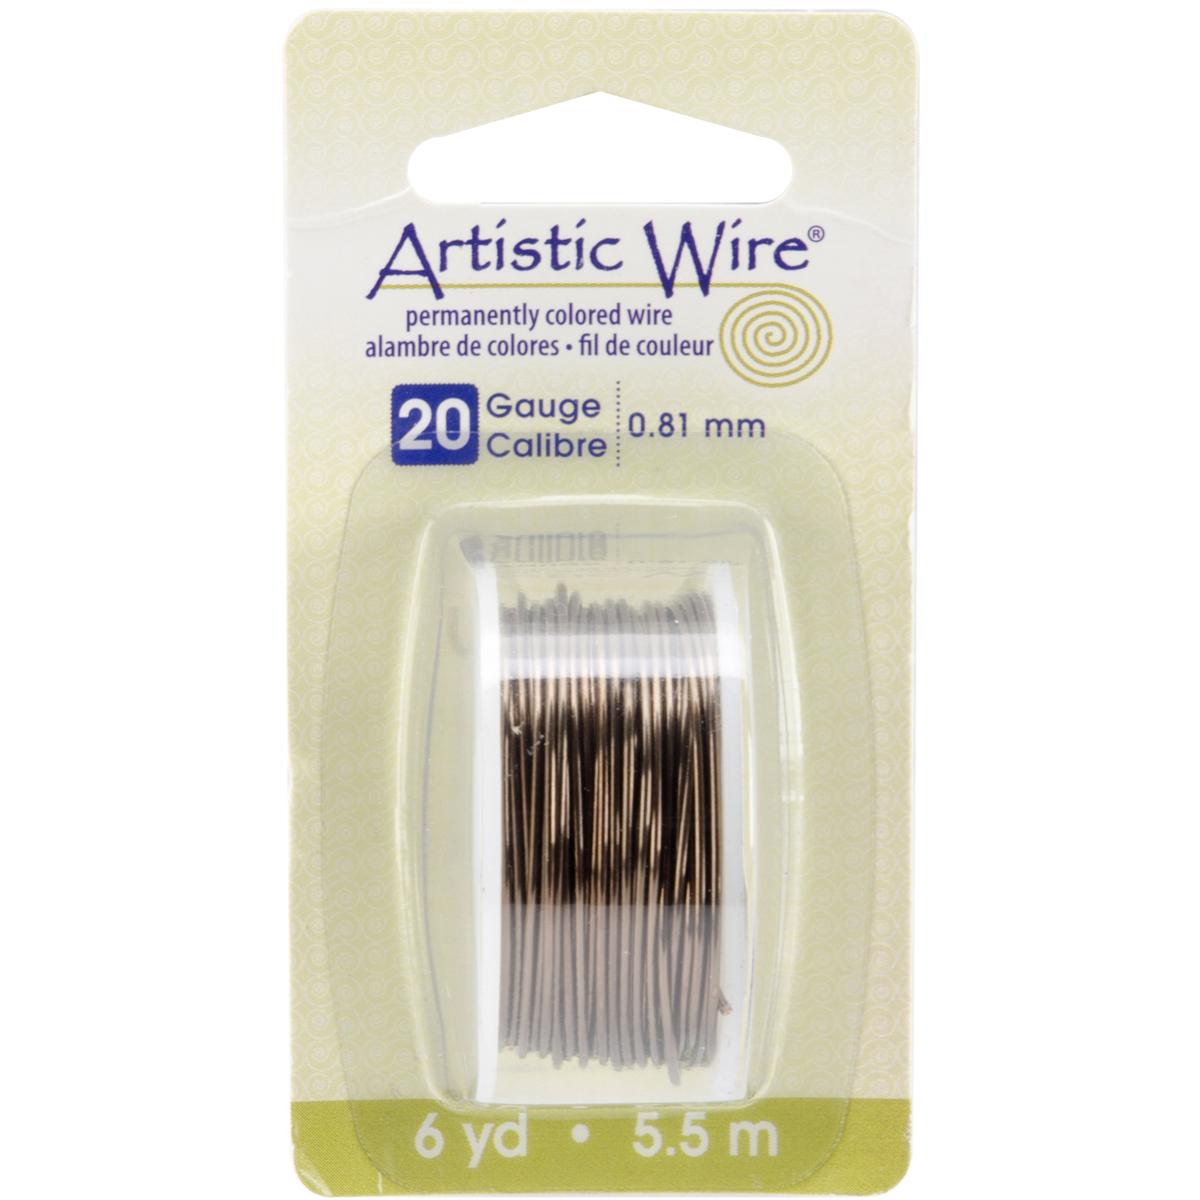 Artistic Wire-Gun Metal - 20 Gauge, 6yd